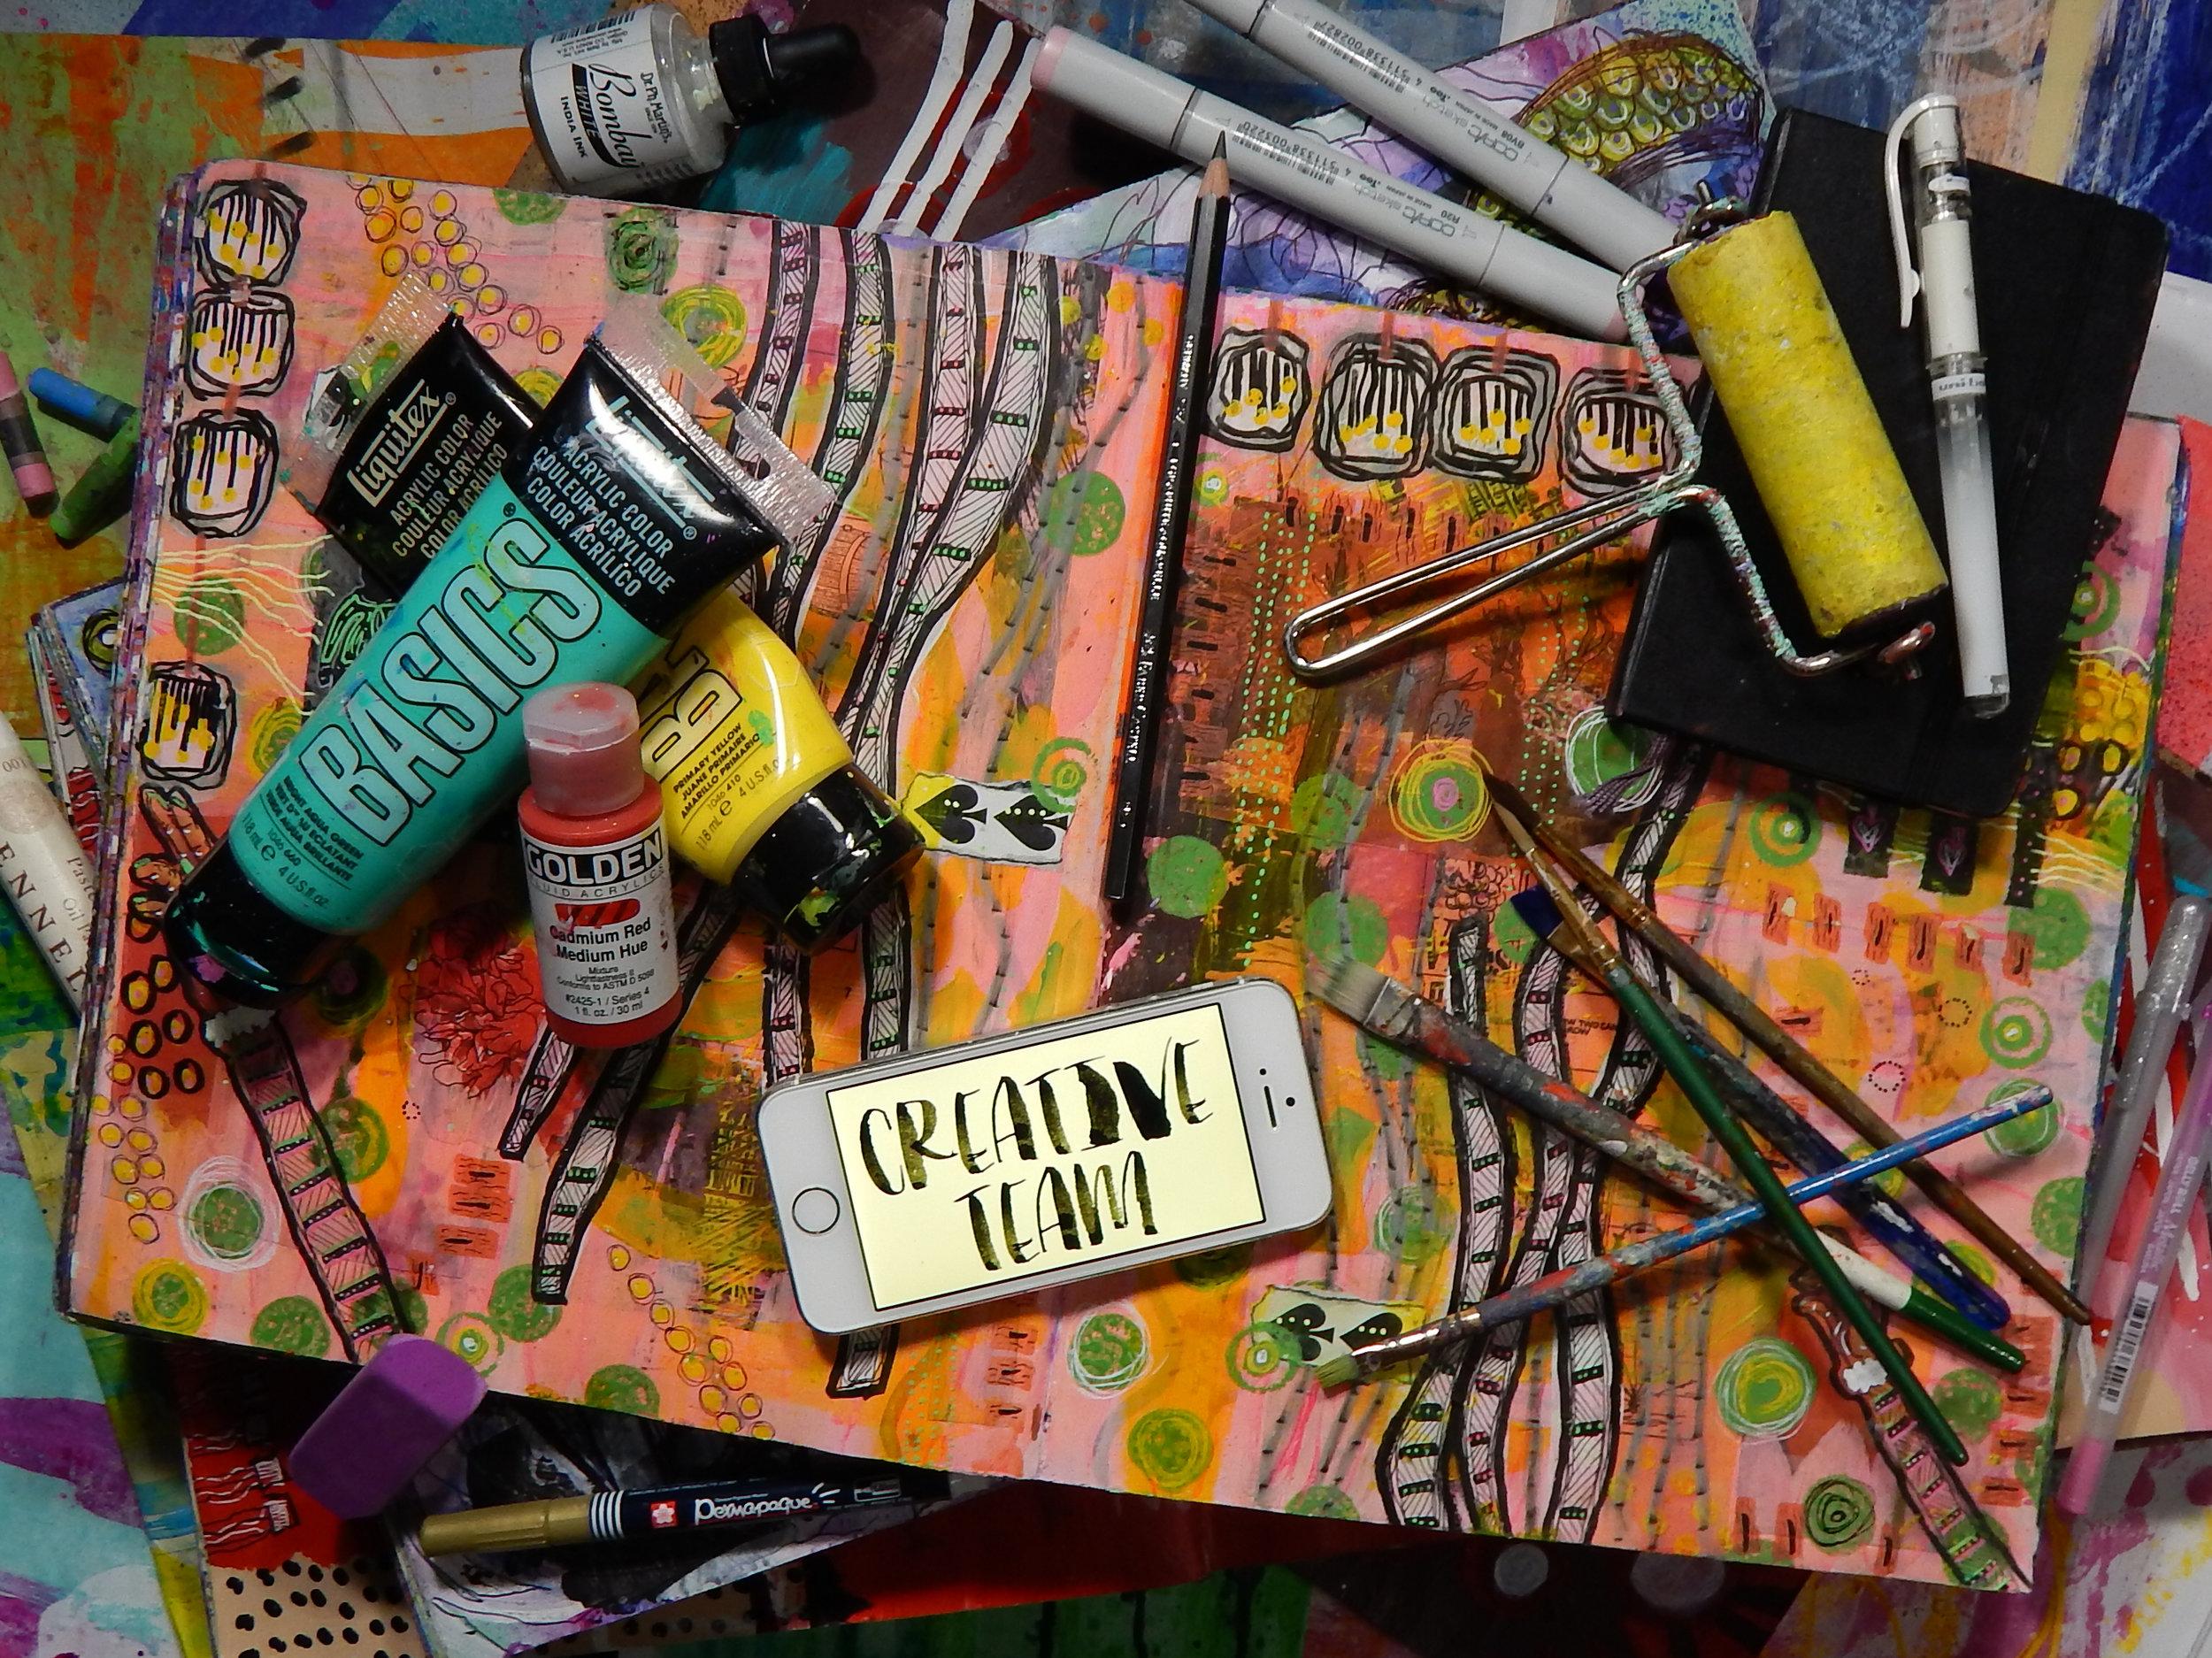 creative-team-announcement-emk-wright-get-messy-art-journal.jpg